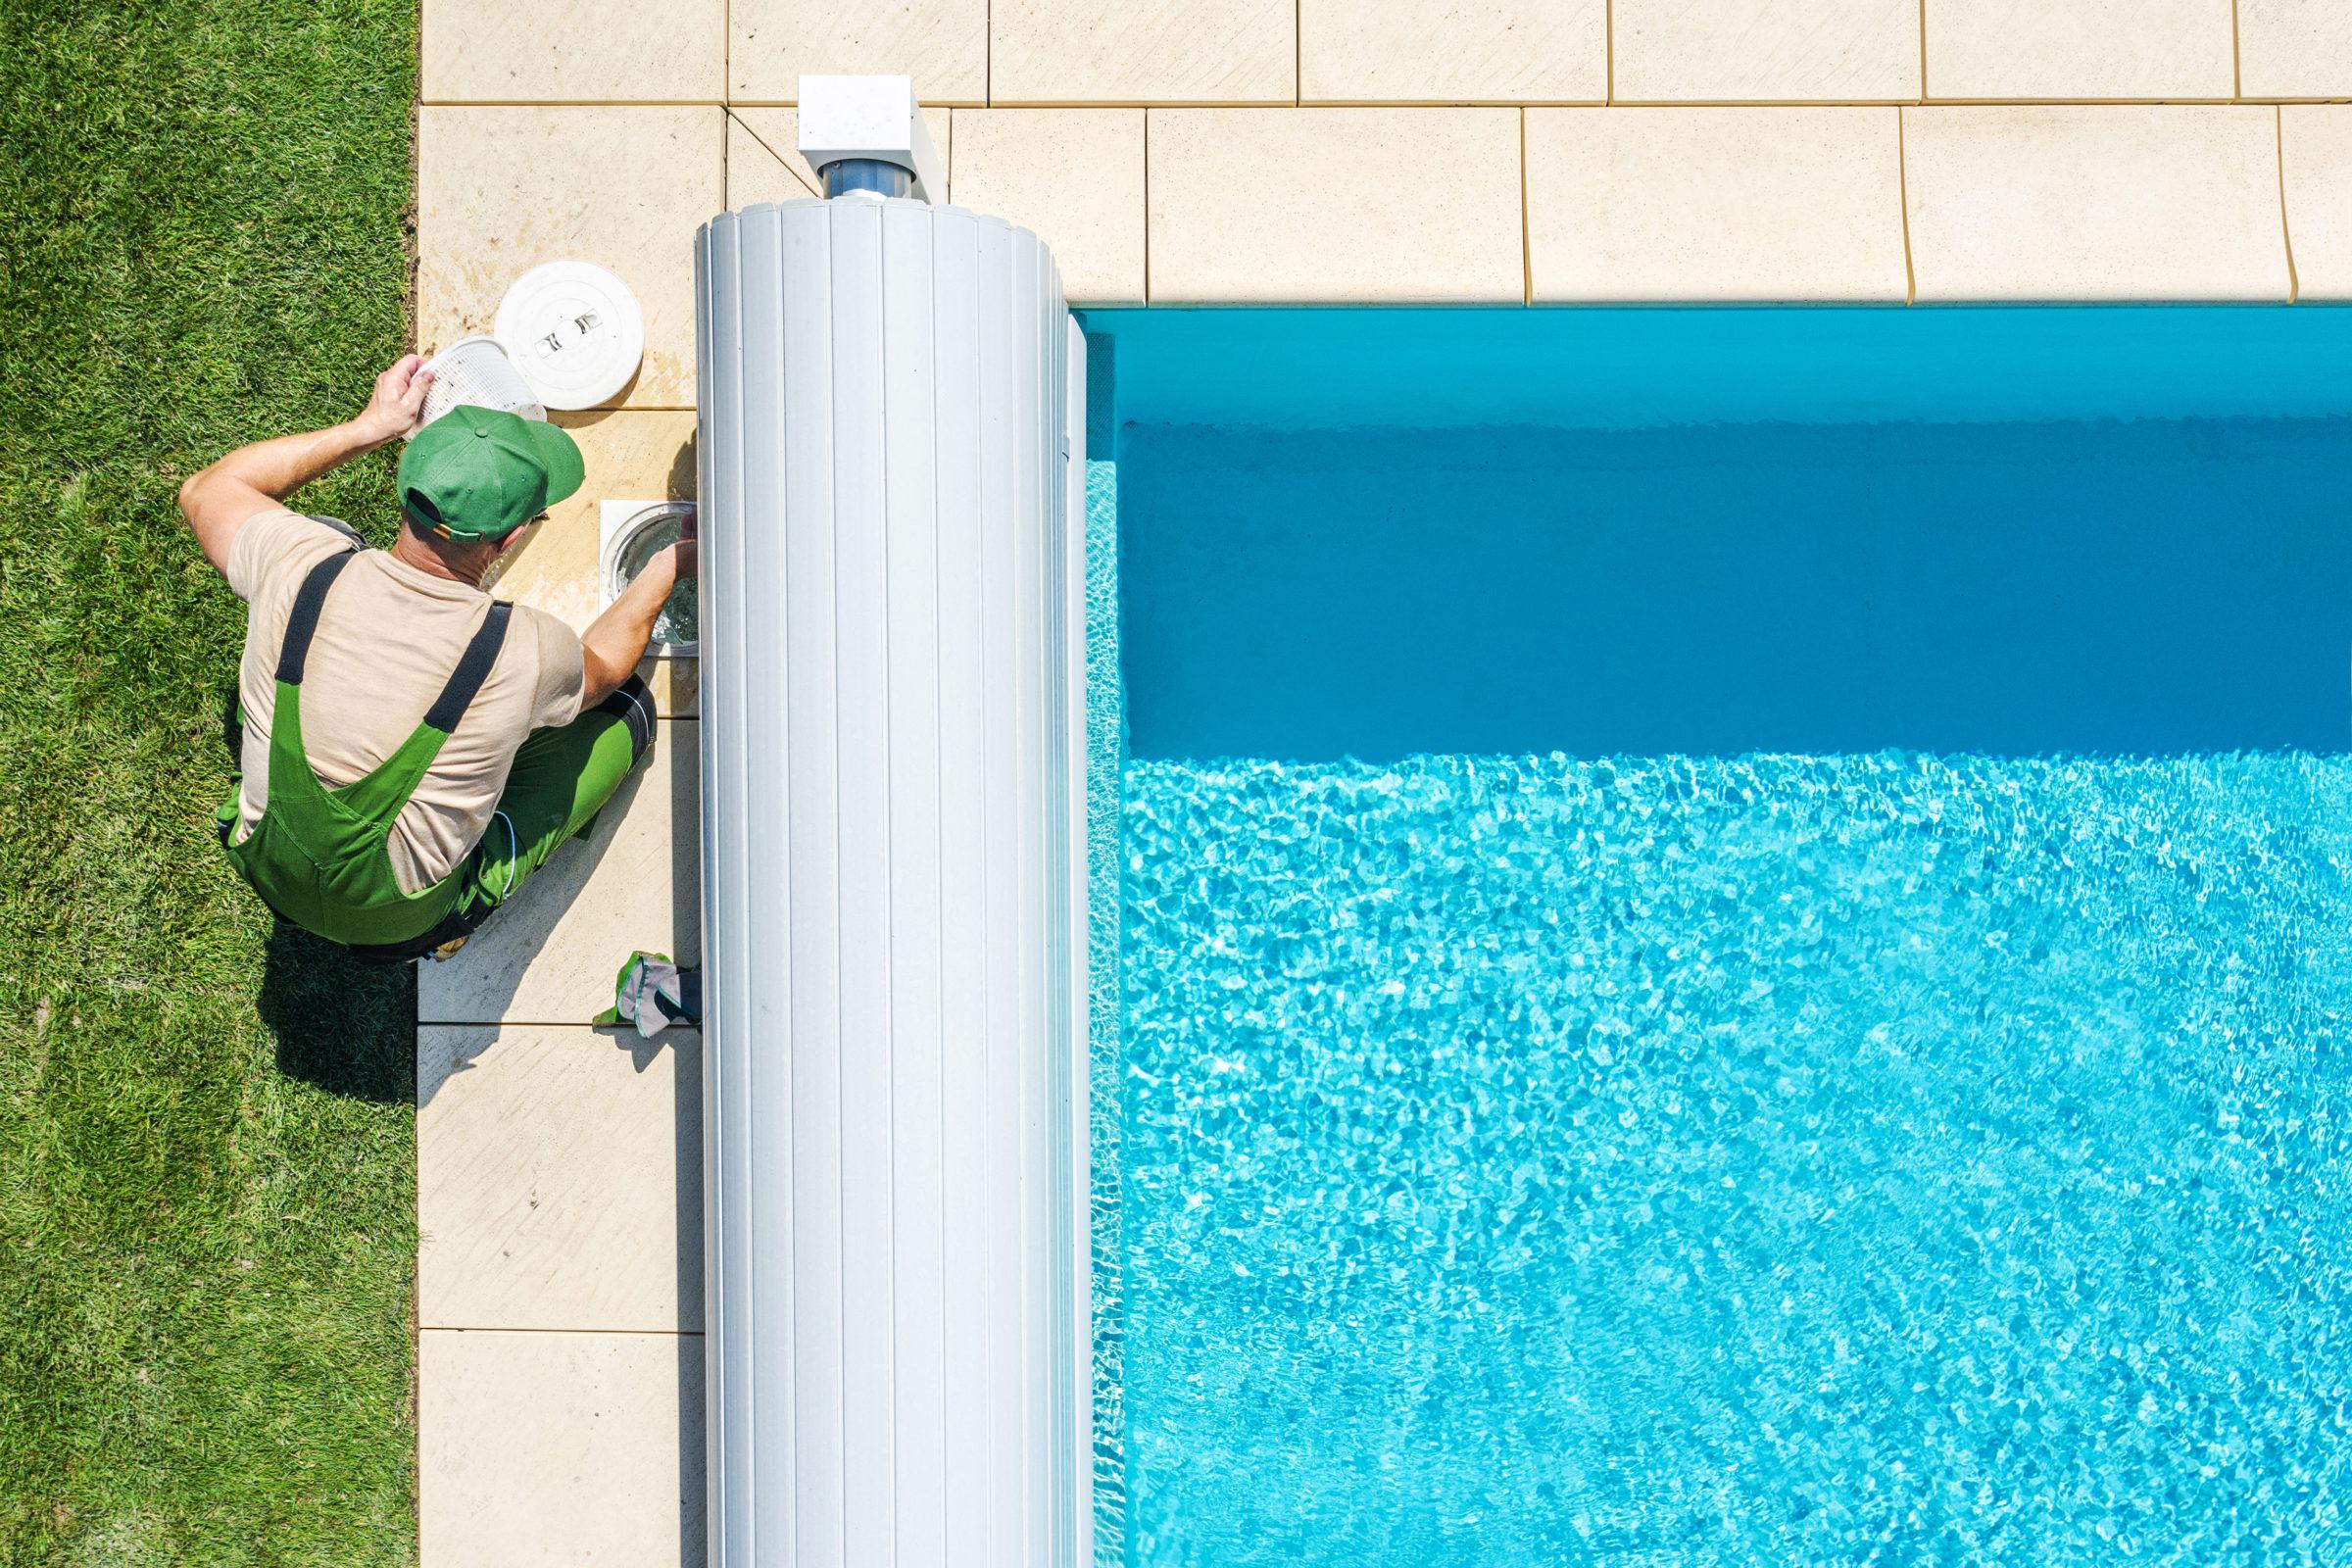 outdoor swimming pool skimmer filter cleaning aeri TXJJT6Y